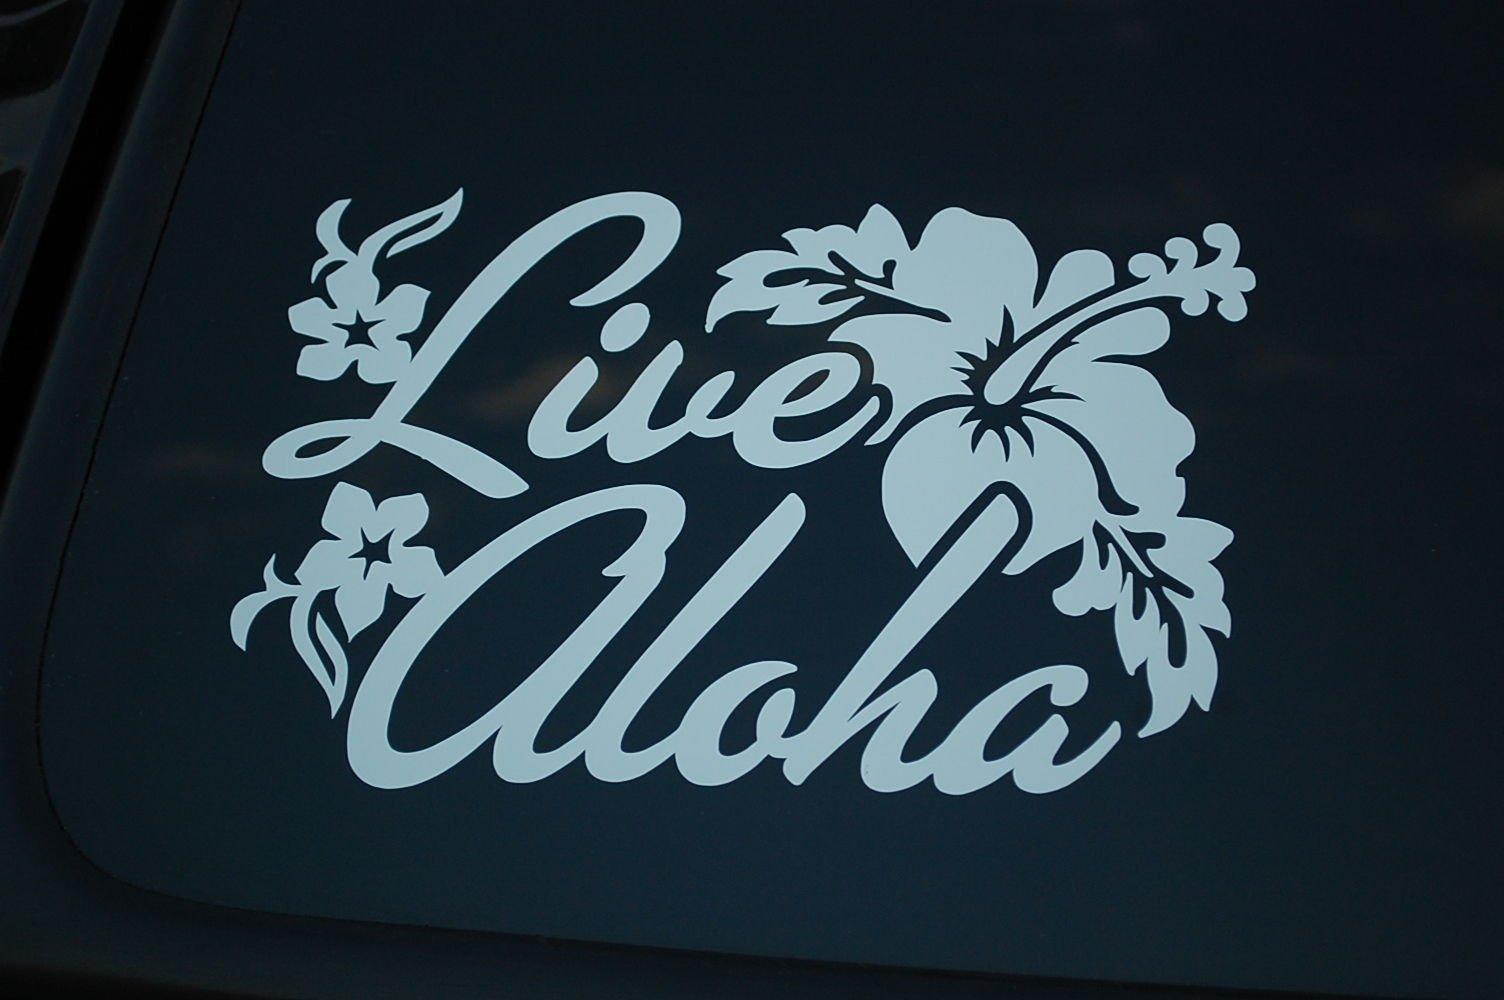 LIVE ALOHA Sticker Vinyl Die Cut Decal Hawaii Car Window Home Wall Deco JDM V295 (18'' x 12'', White)